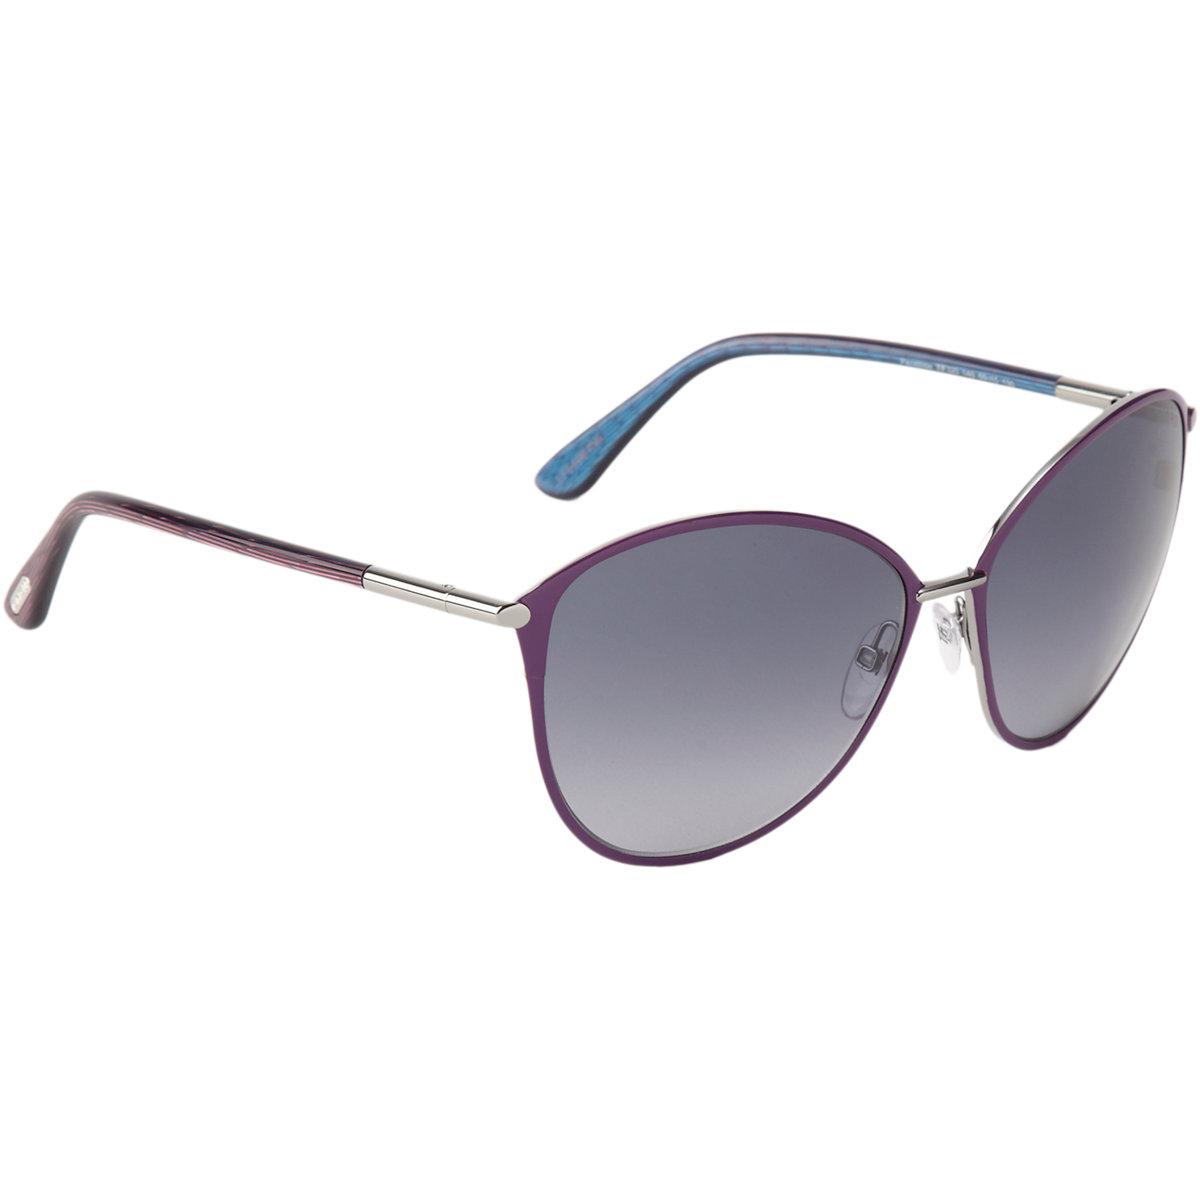 lyst tom ford penelope sunglasses in purple. Black Bedroom Furniture Sets. Home Design Ideas